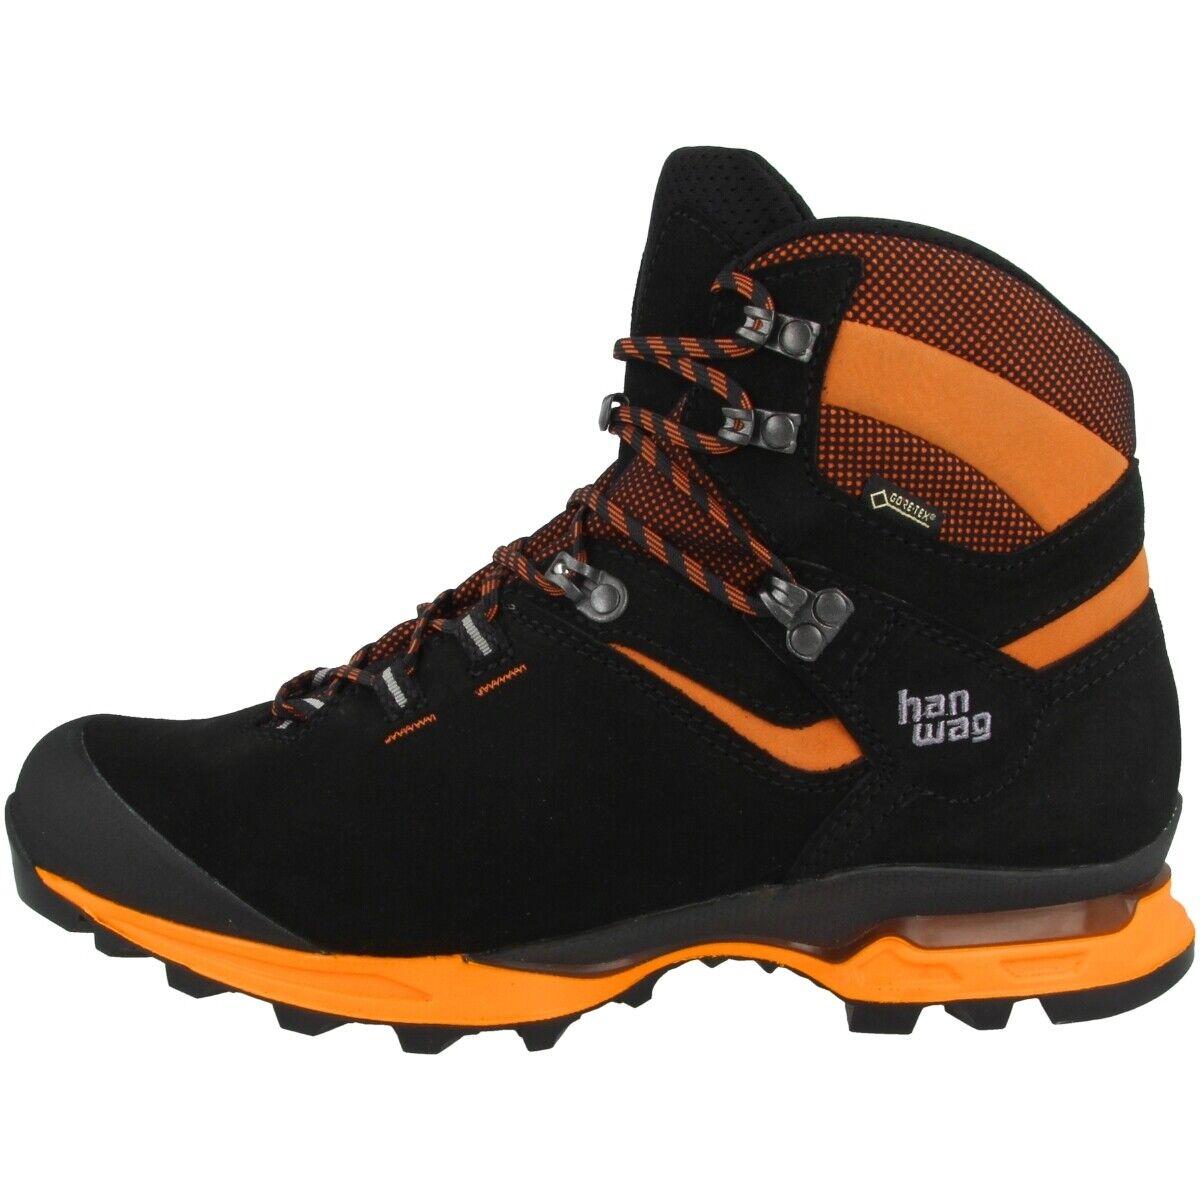 Hanwag Tatra Light GTX botas Hombre Gore-Tex Exterior Excursionismo Zapatos